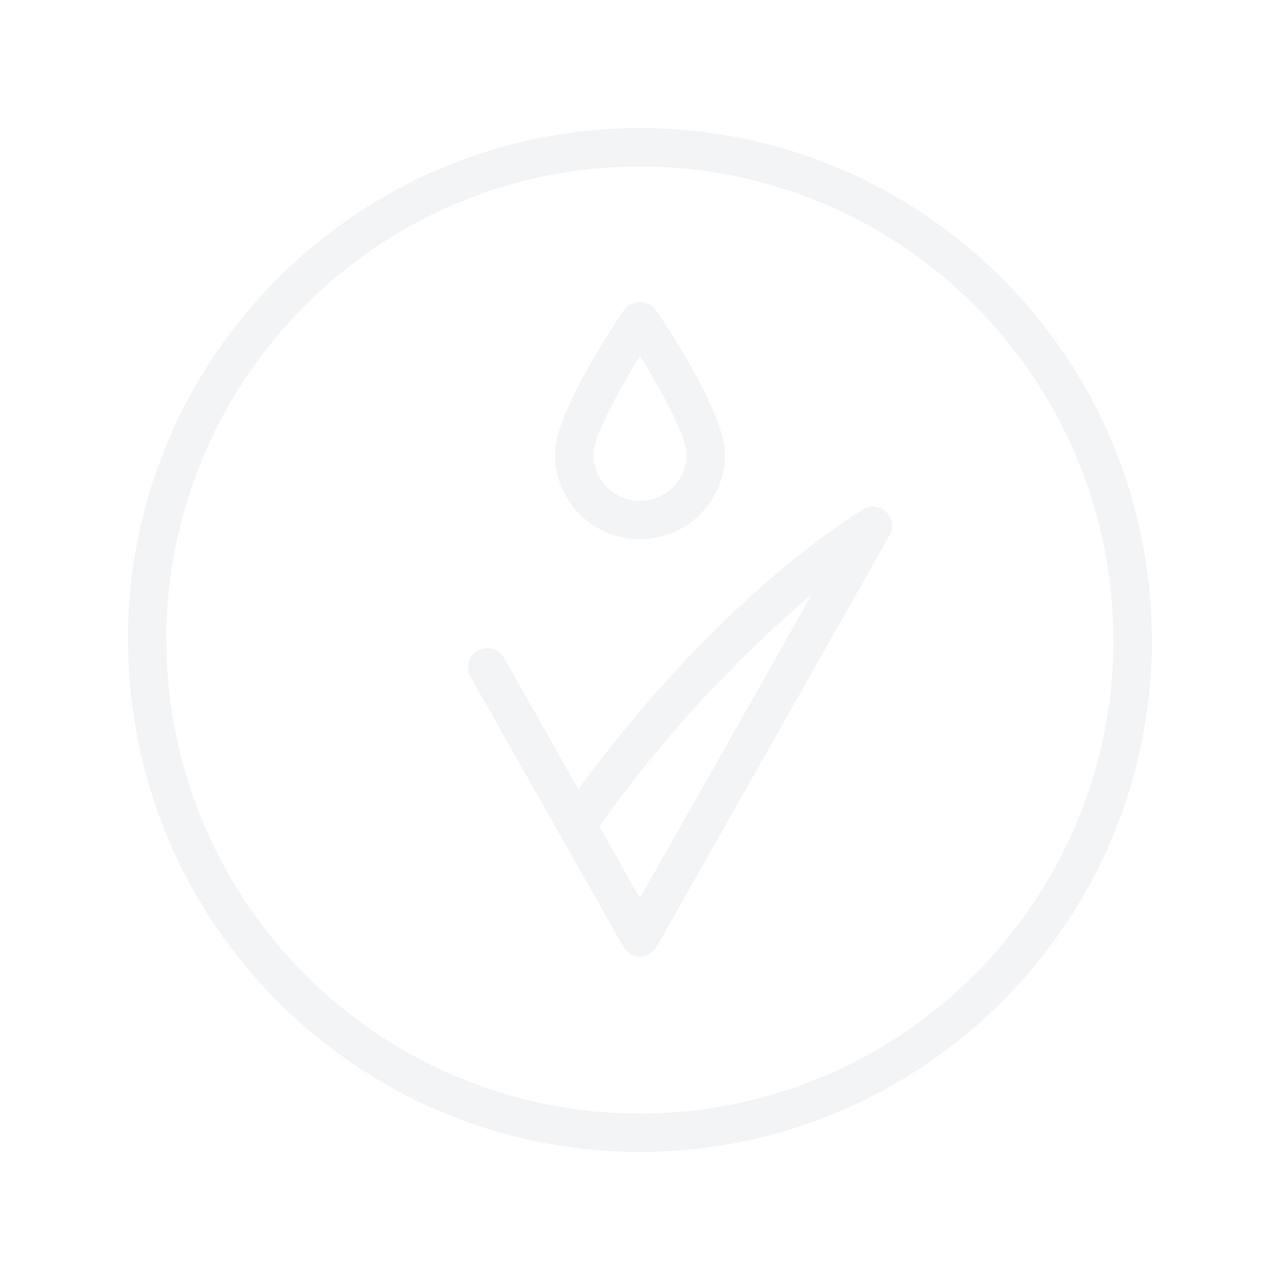 Versace Man Eau Fraiche Deodorant Spray 100ml